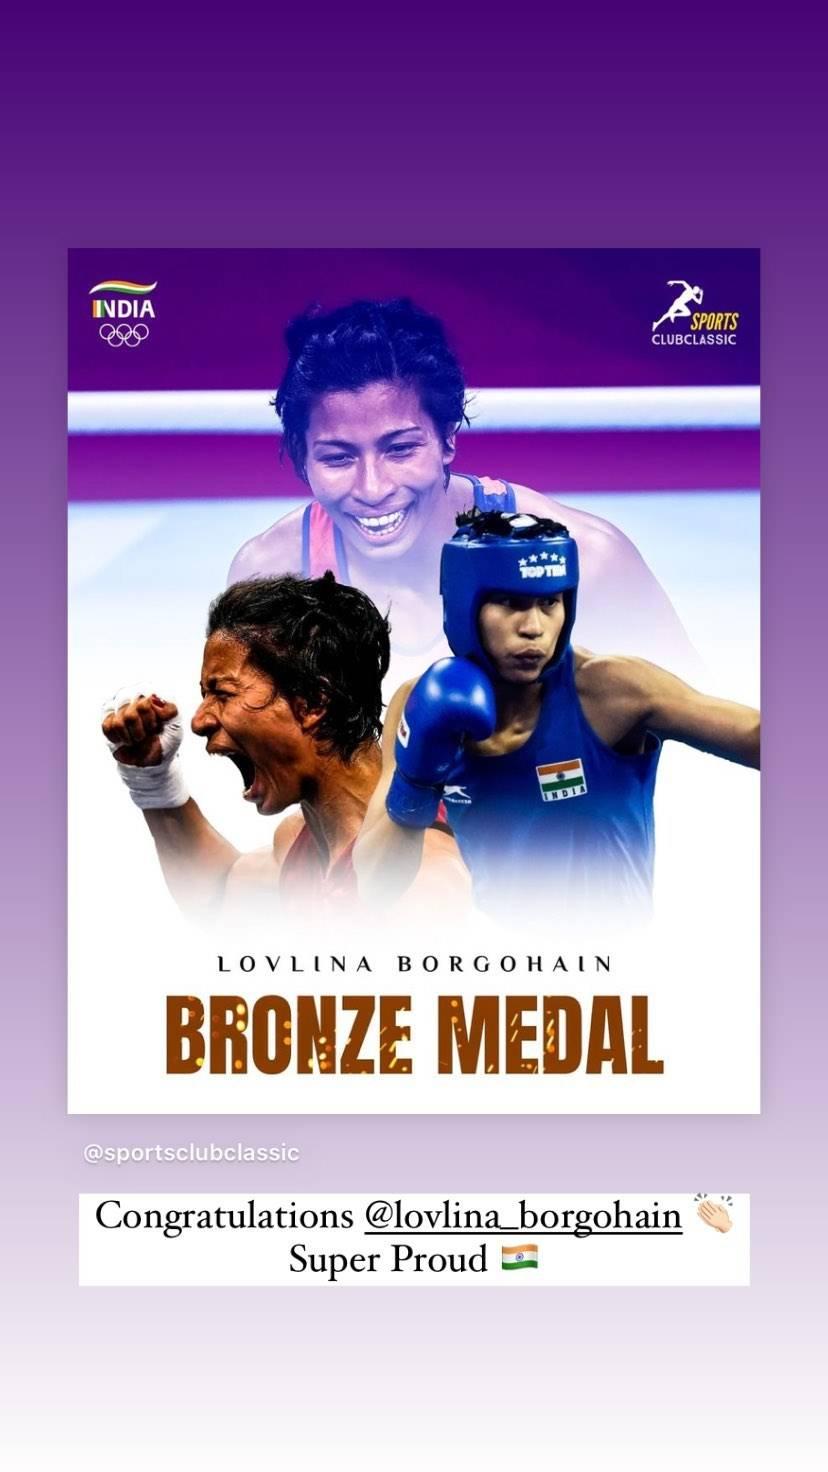 B'Wood wish Lovlina as she clinches bronze